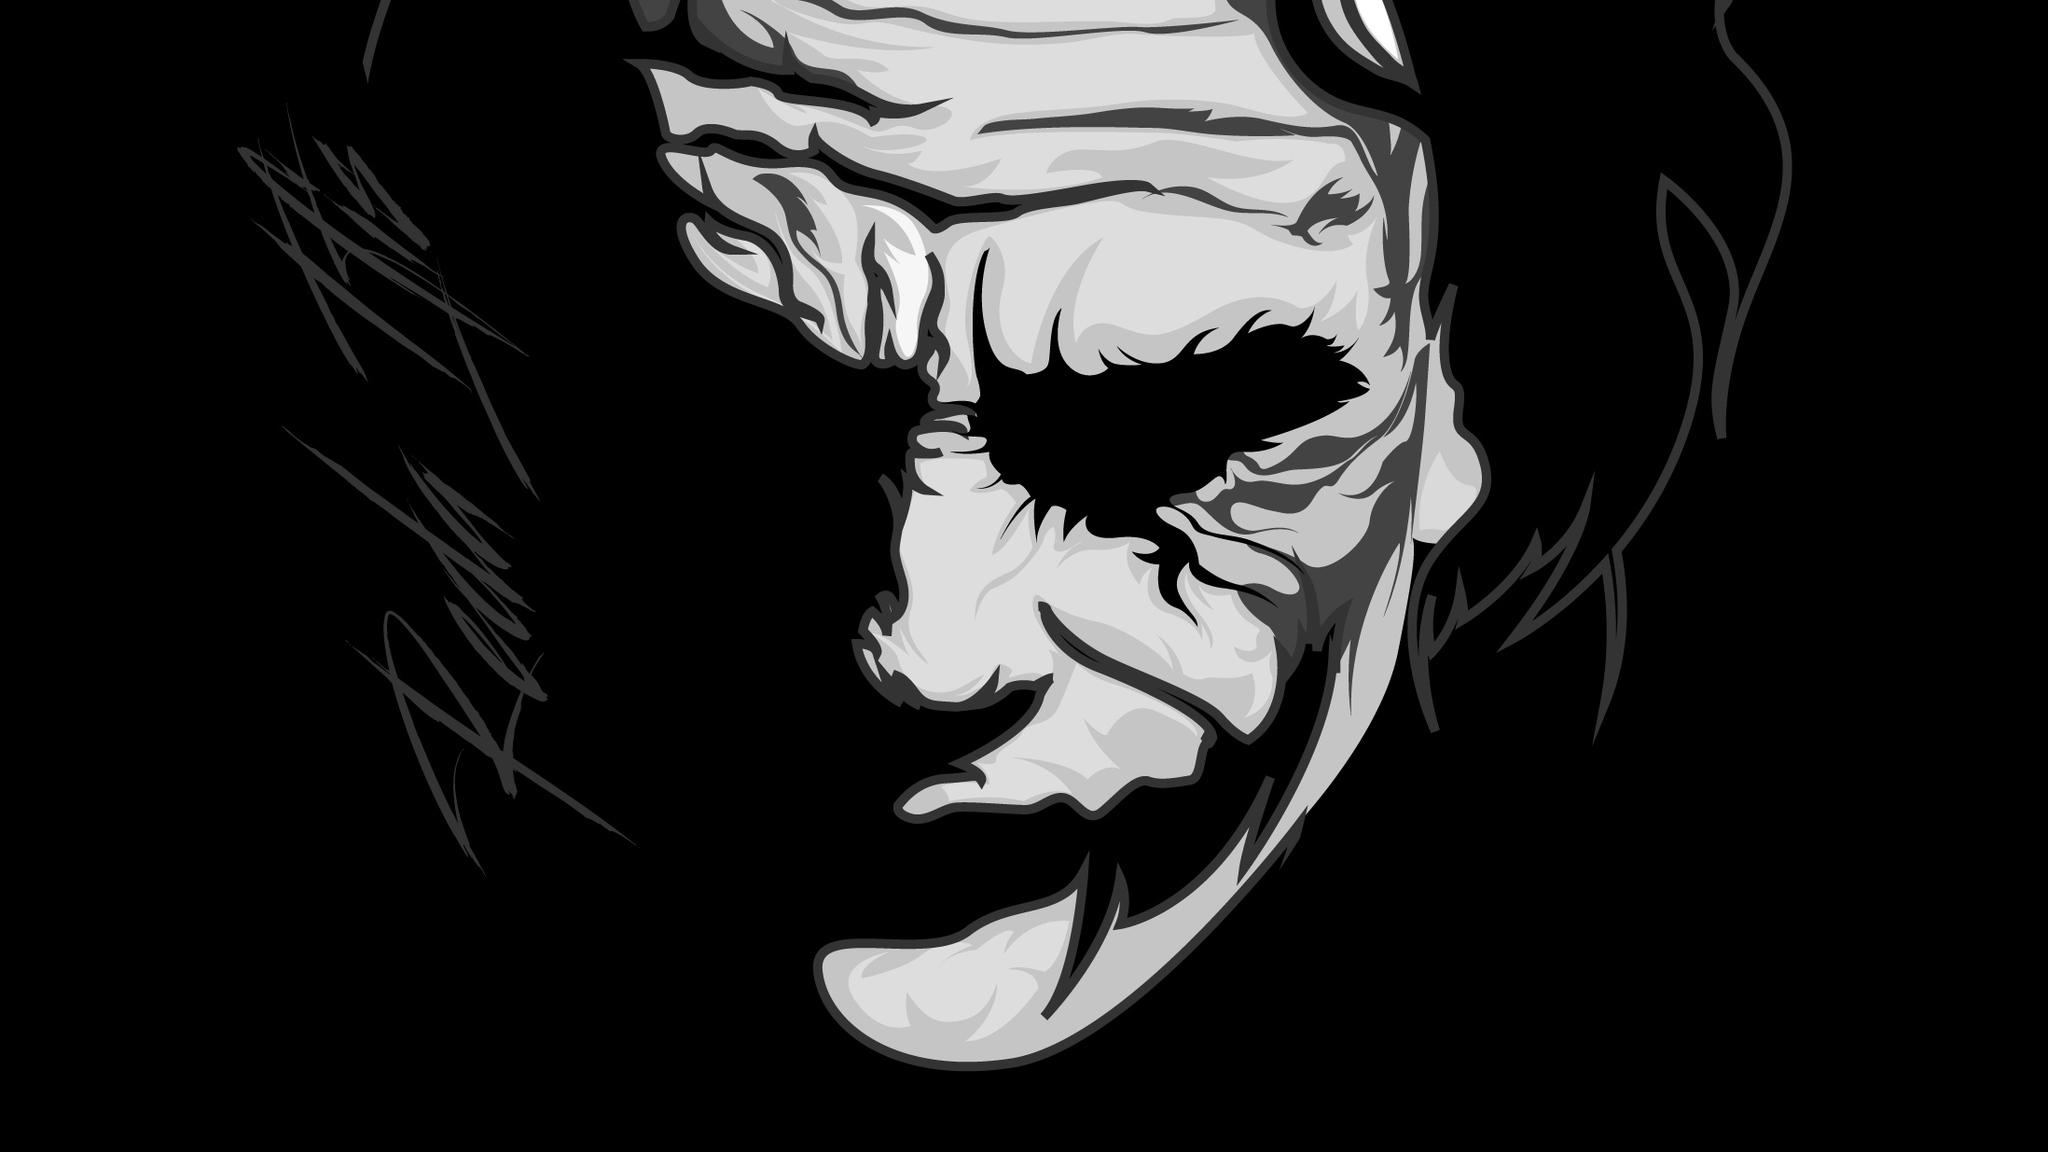 2048x1152 Joker Monochrome 2048x1152 Resolution Hd 4k